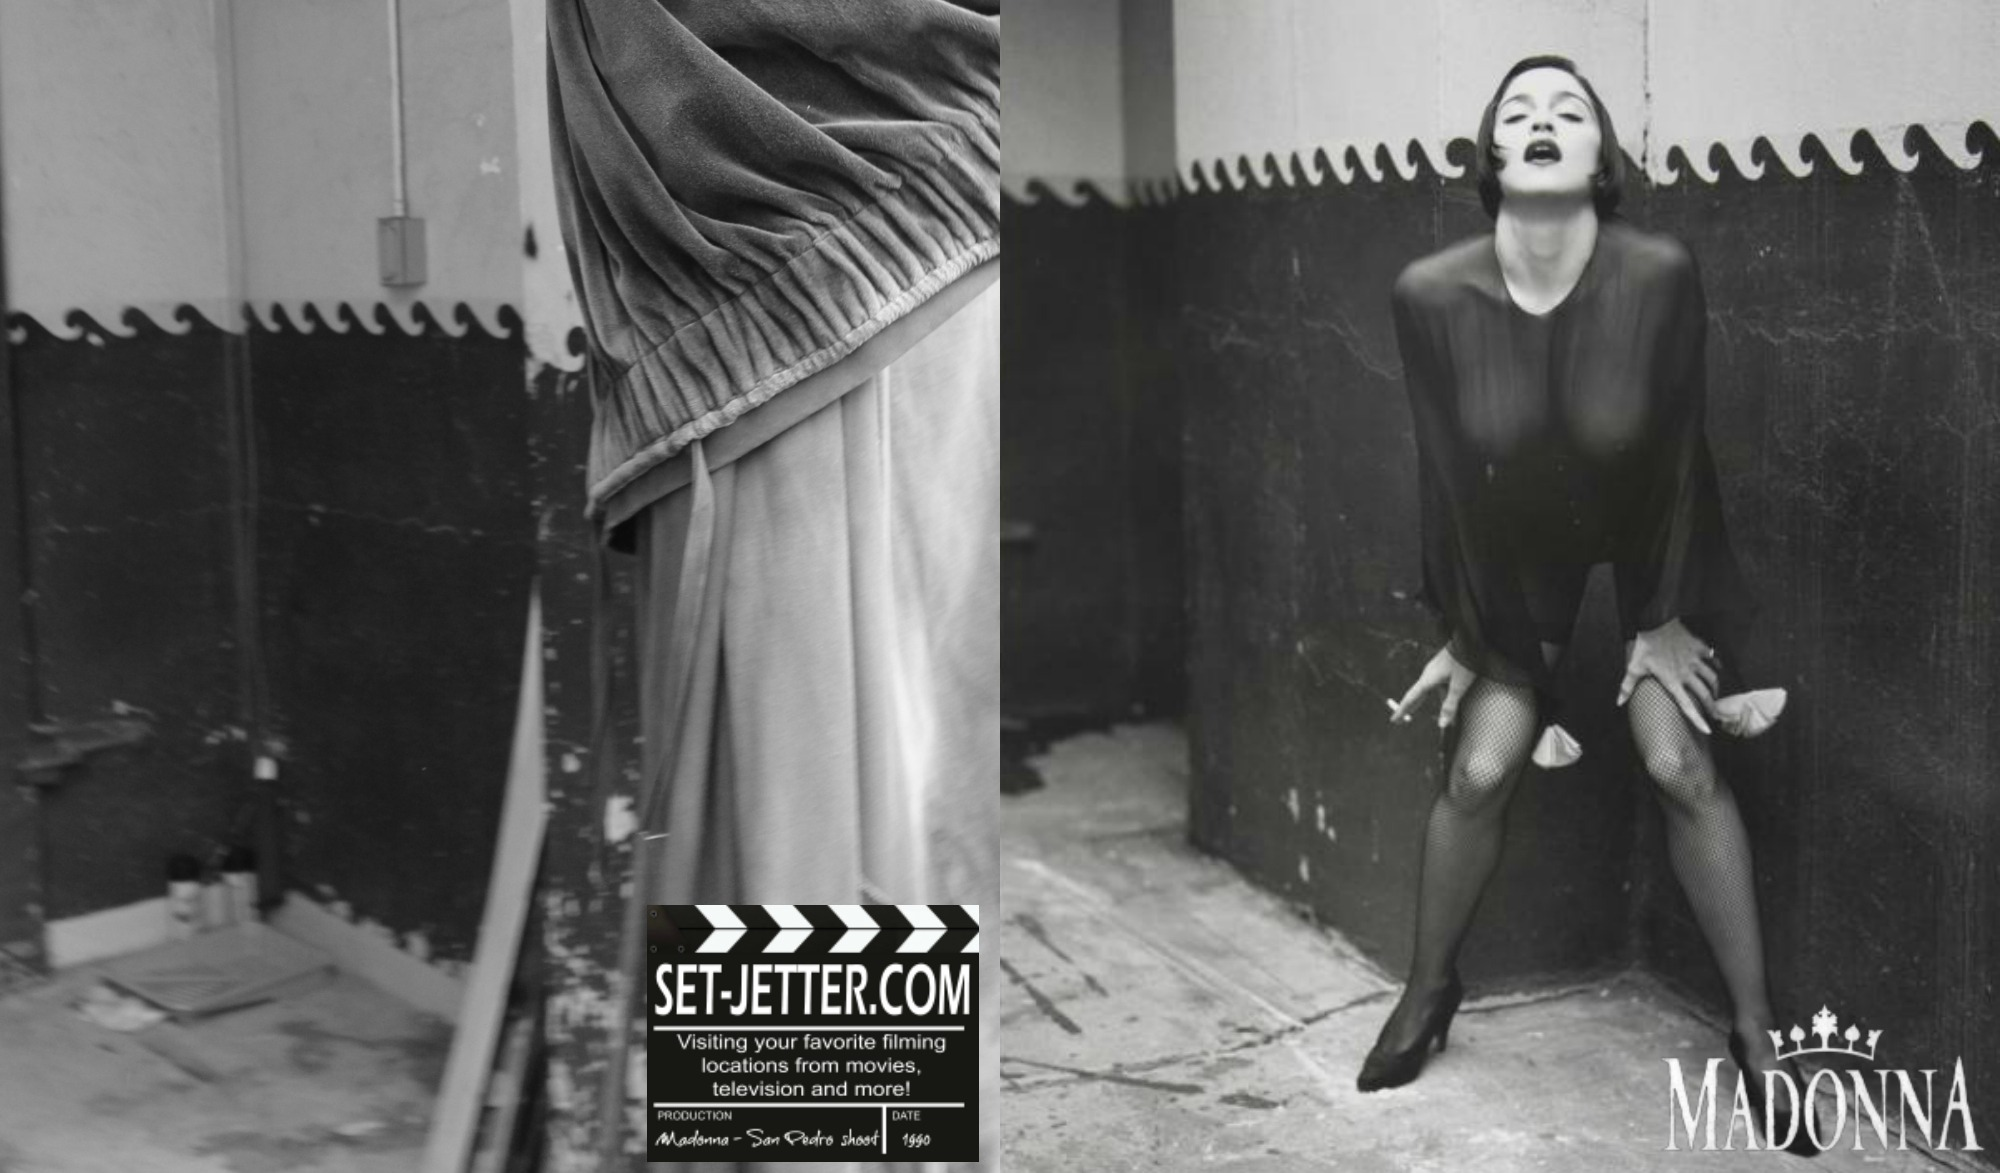 Madonna-HerbRitts-11a.jpg